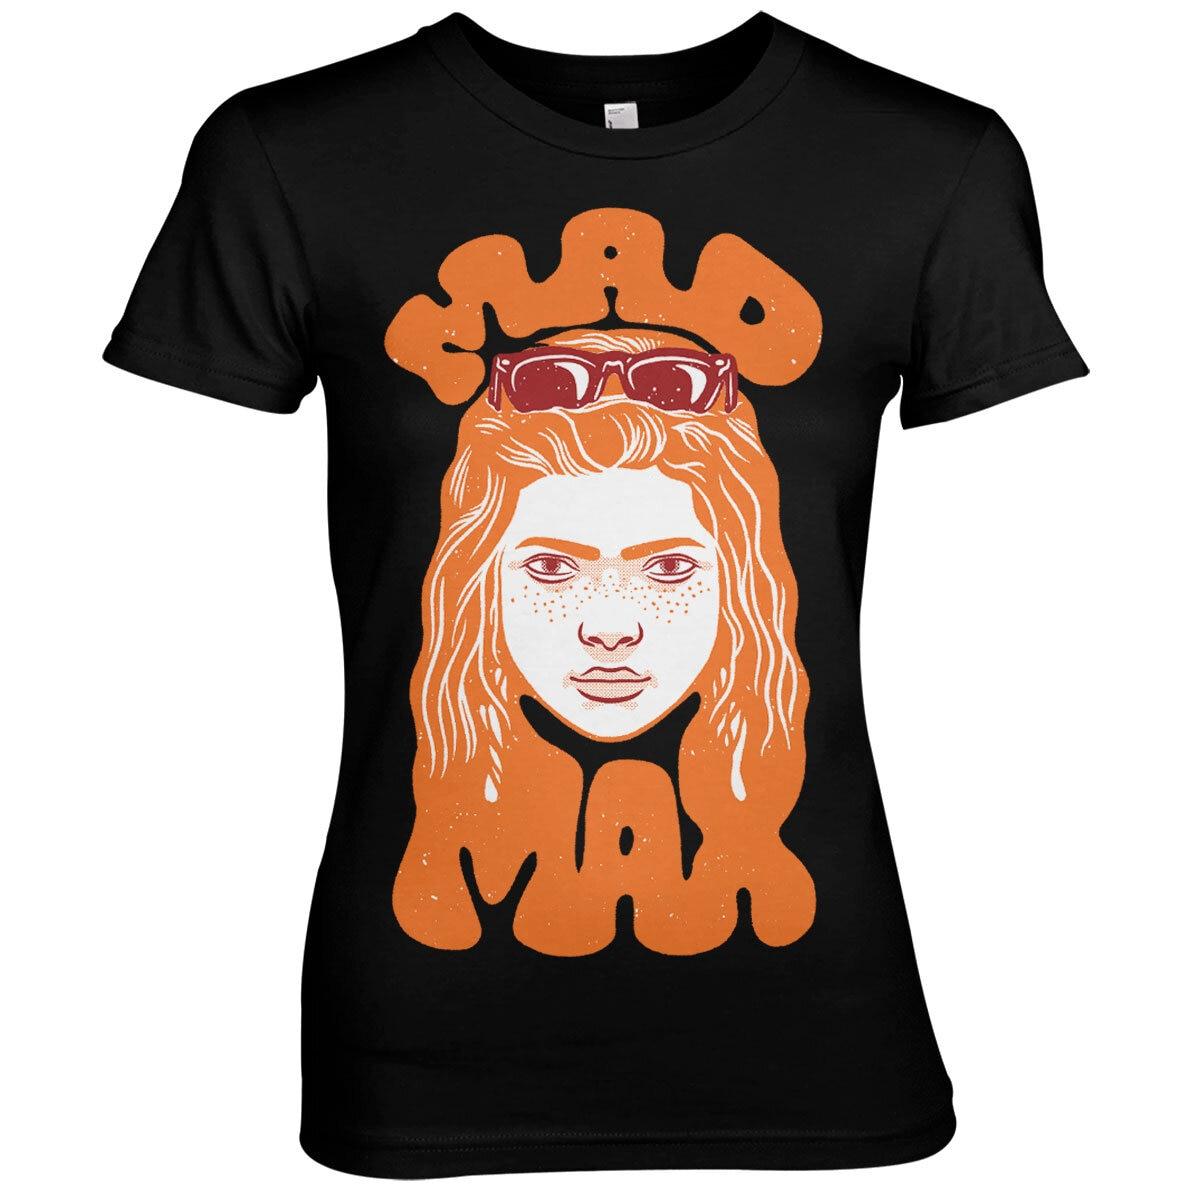 Stranger Things - Mad Max Girly Tee